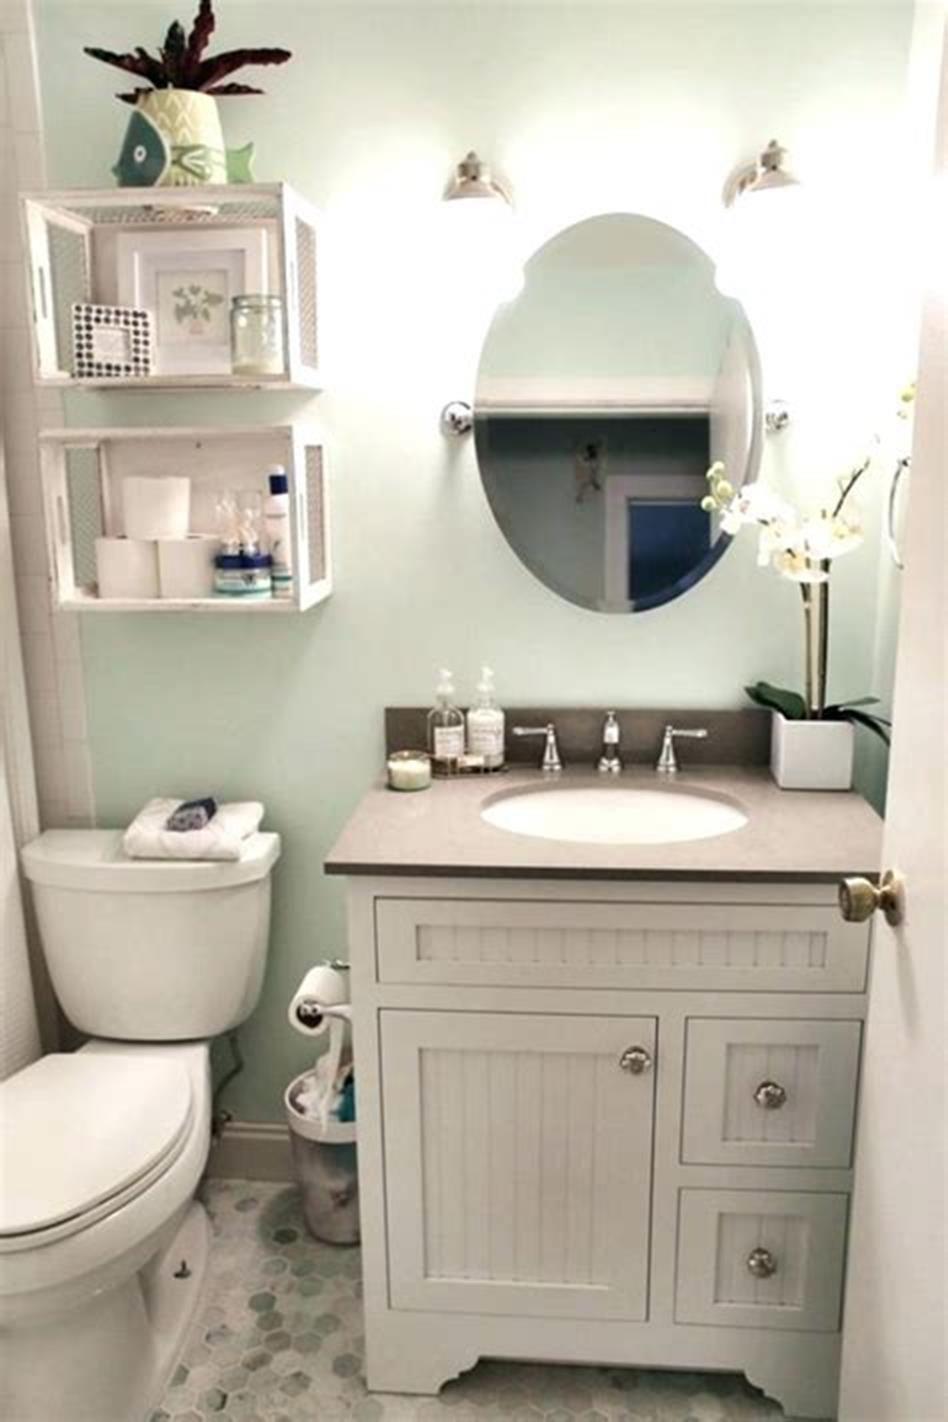 10 Most Popular Half Bathroom Decor Ideas 10 - DecoRequired